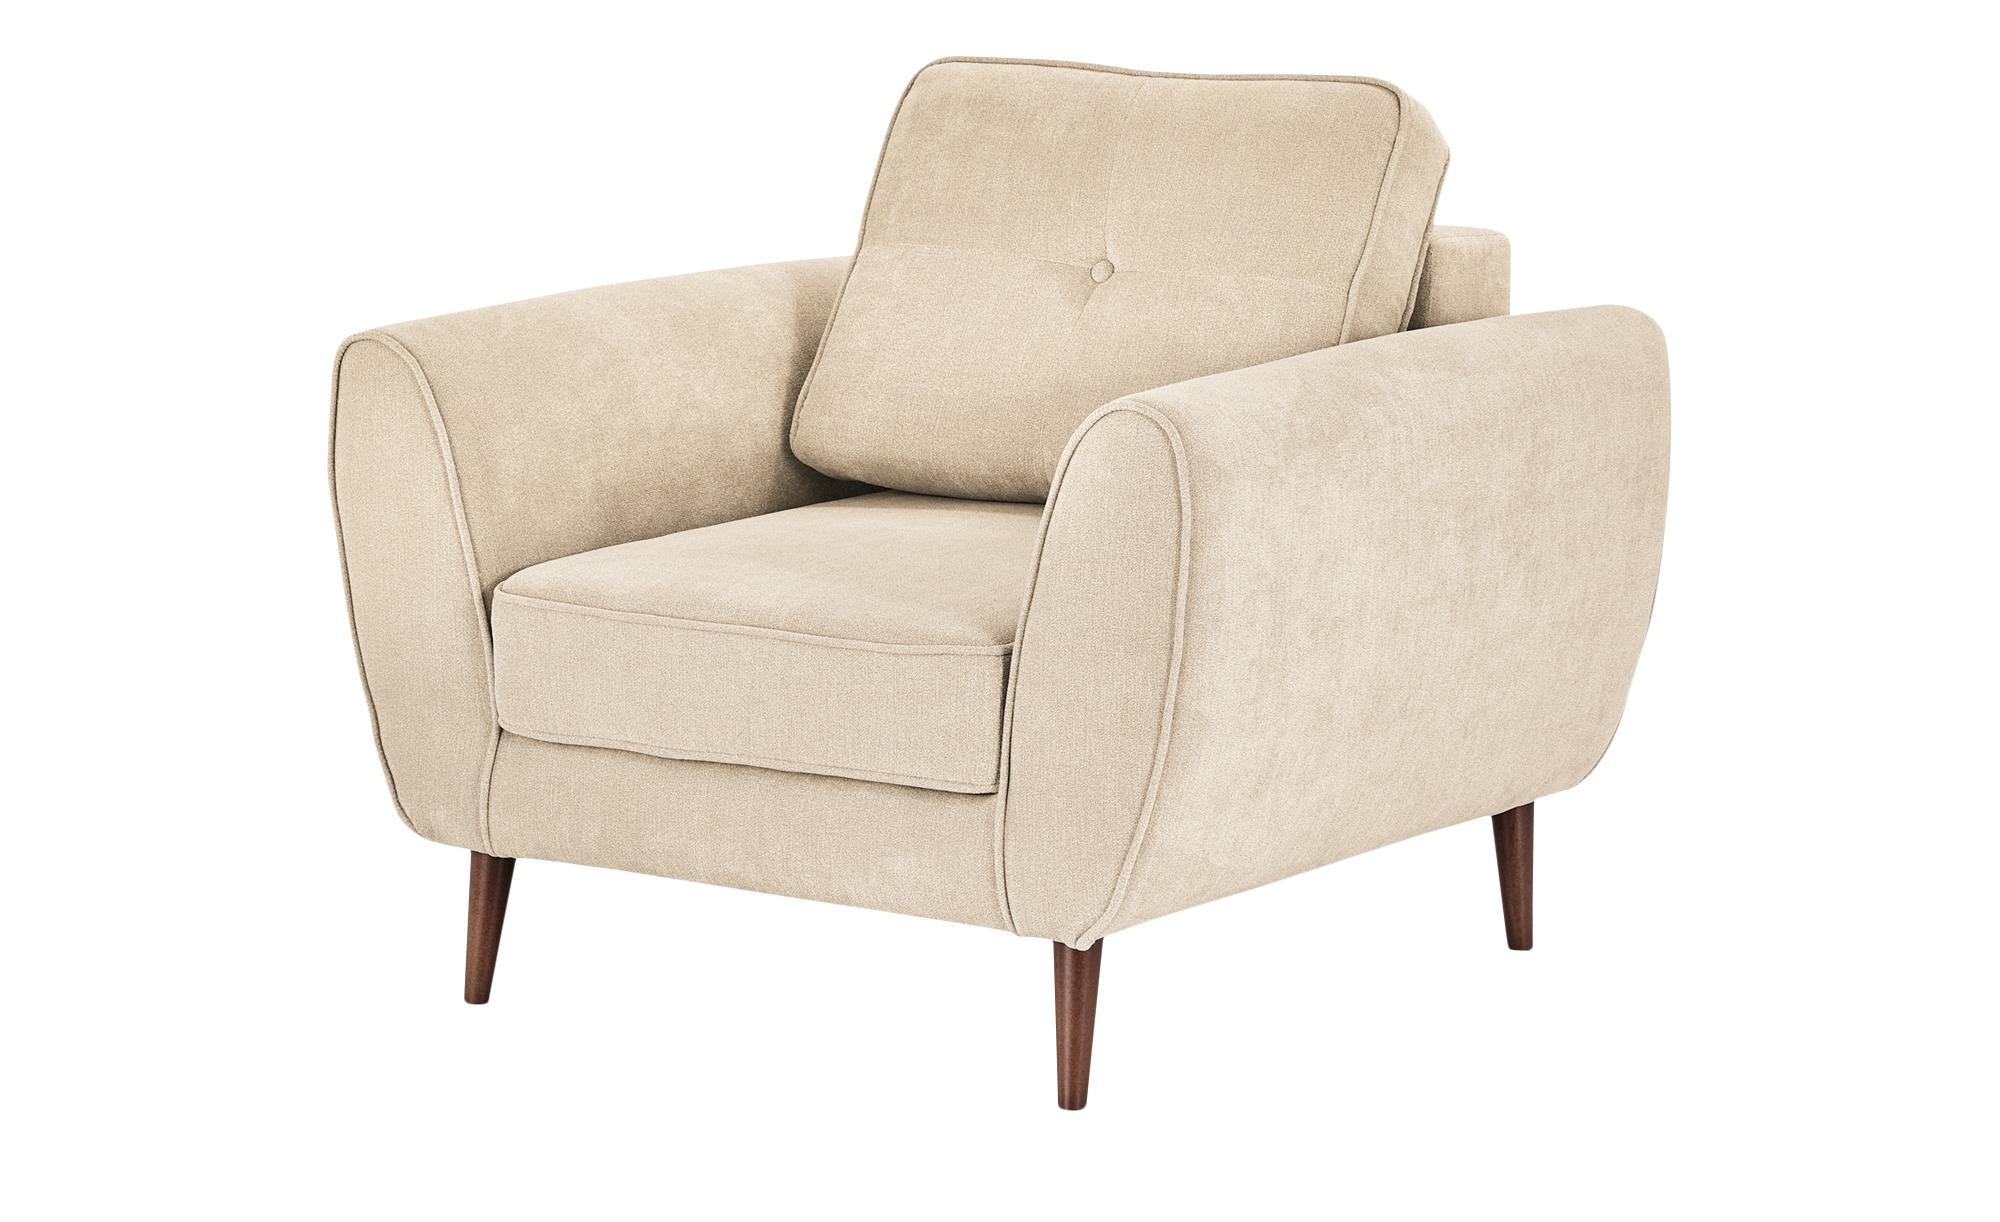 switch Sessel  Candy ¦ creme ¦ Maße (cm): B: 102 H: 85 T: 94 Polstermöbel > Sessel > Polstersessel - Höffner